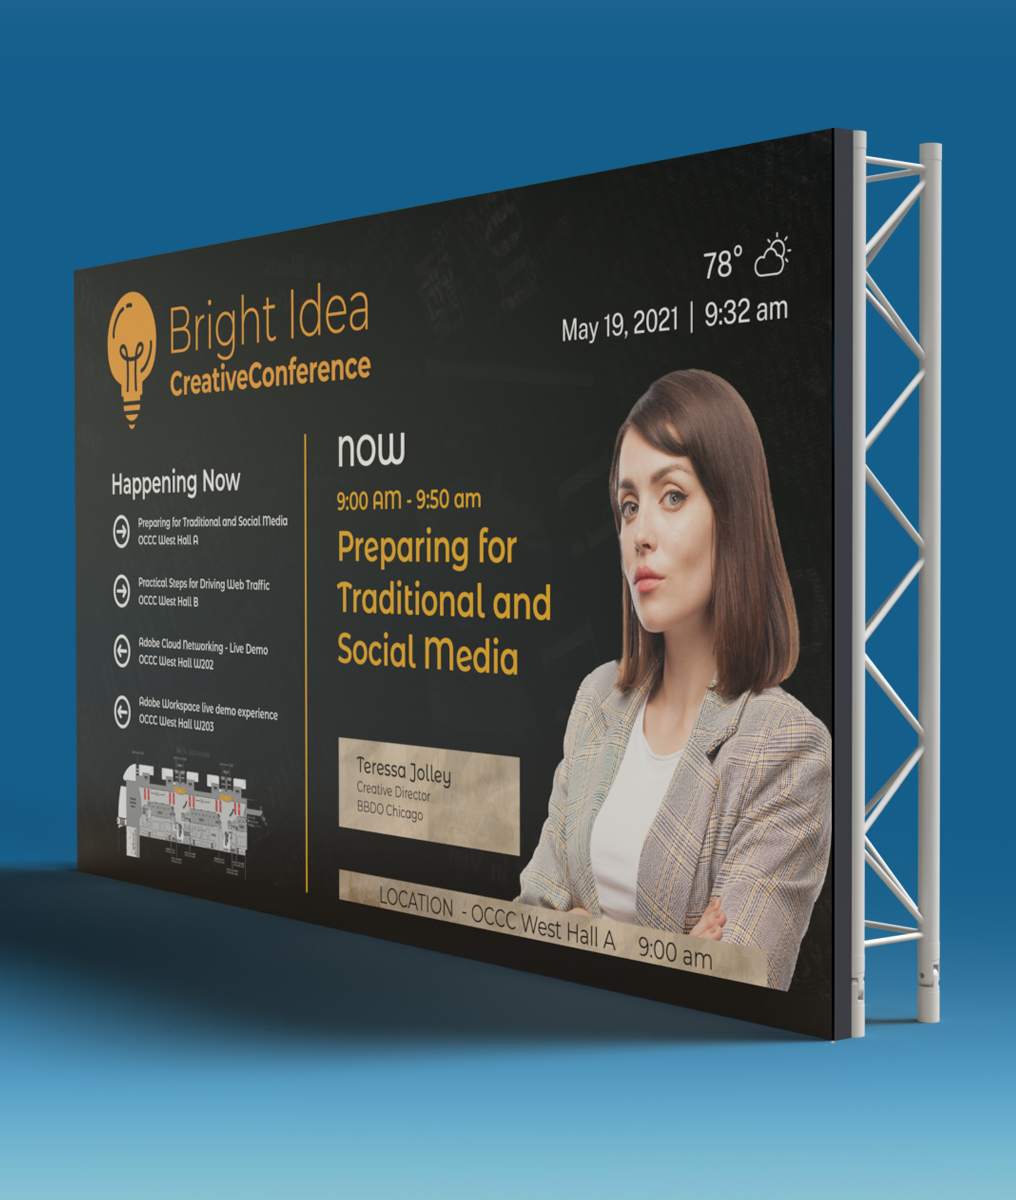 XPO-Branding-LED-Wall